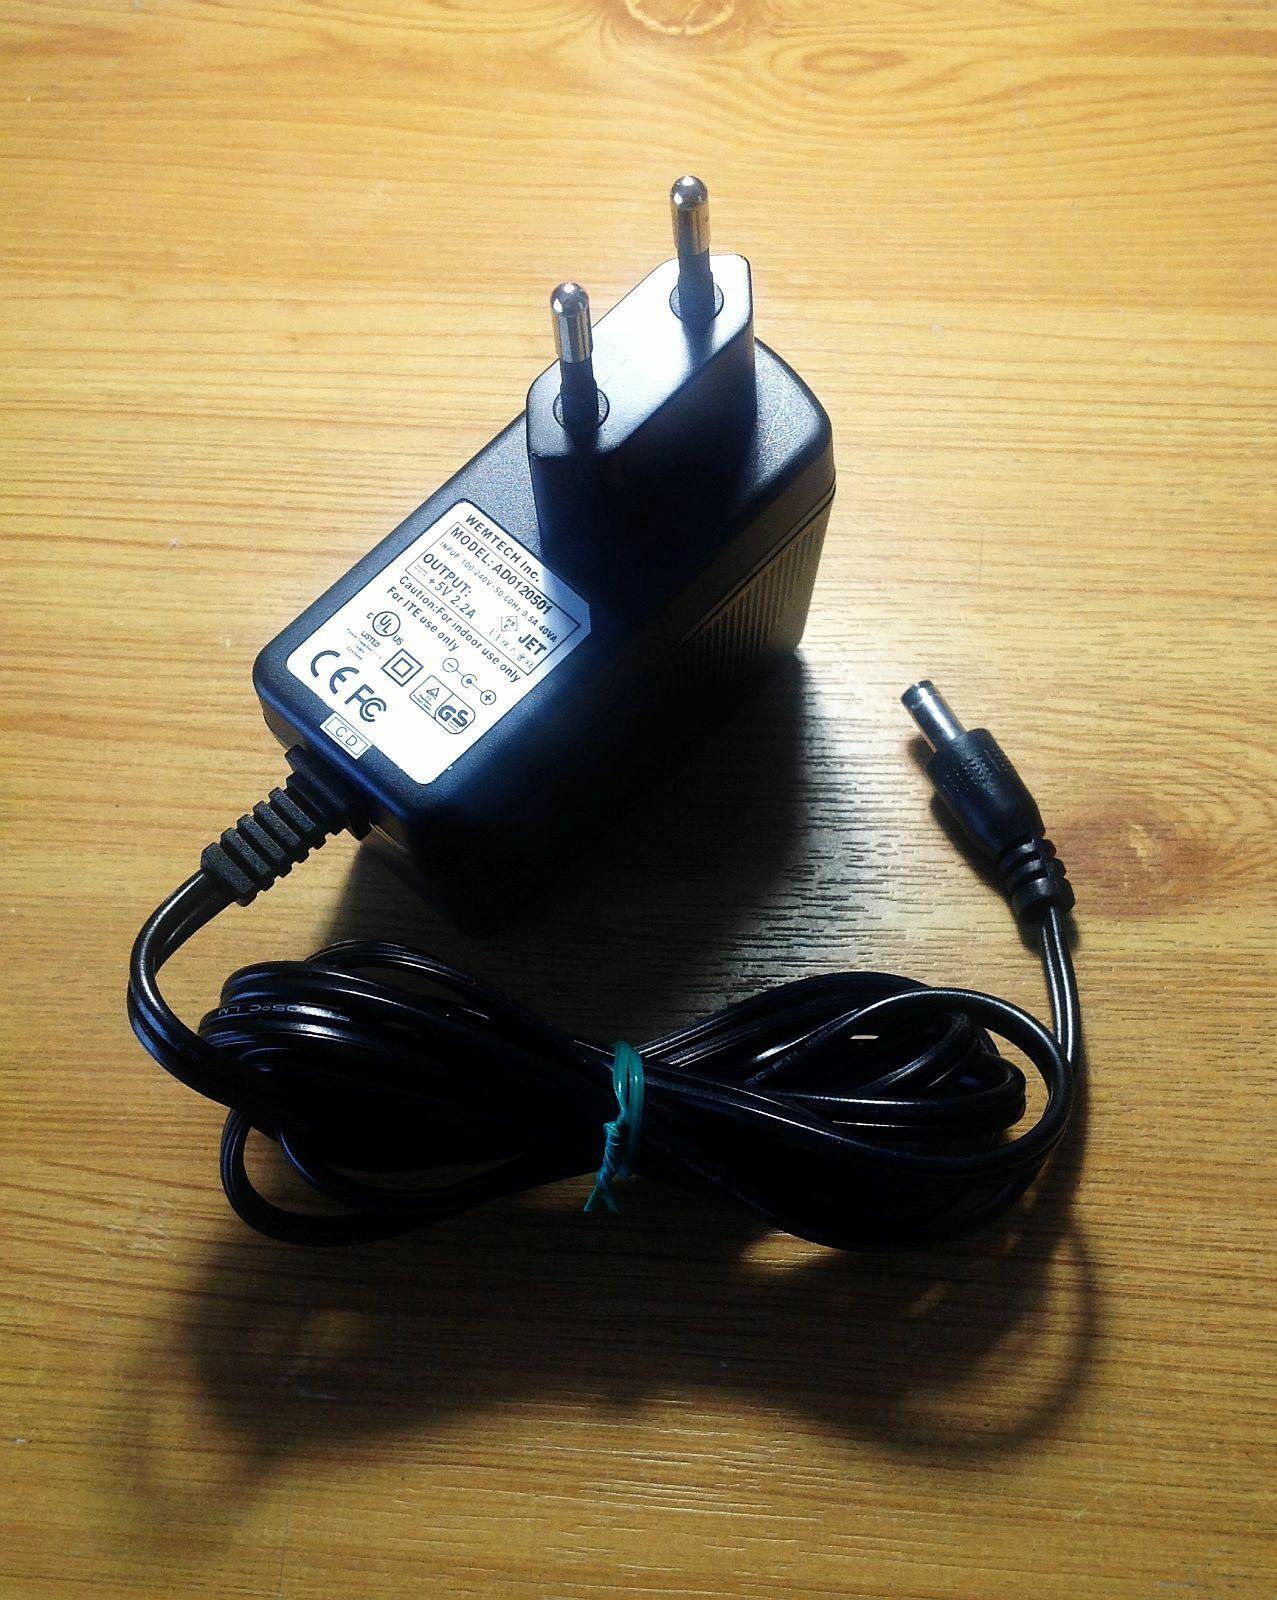 .. Vintage WEMTECH Inc. AD0120501 AC to 5VDC Adaptor, Euro 2 round pins mains pl